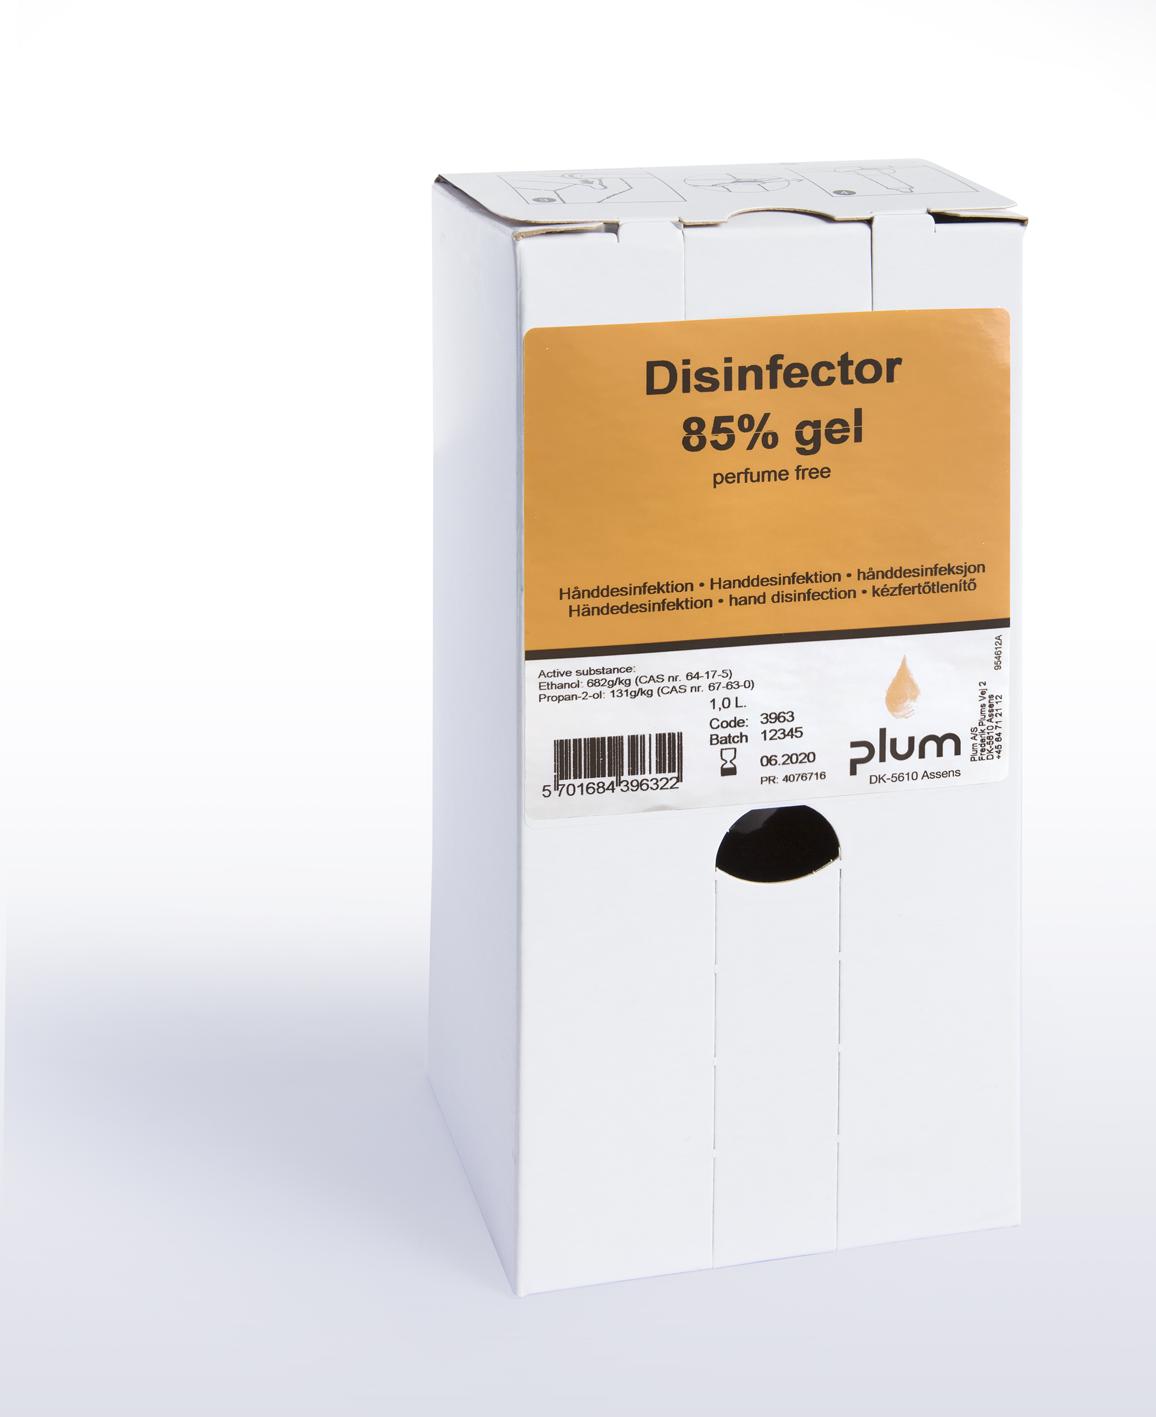 Desinfektion 85% gel 1 l bag in box Plum